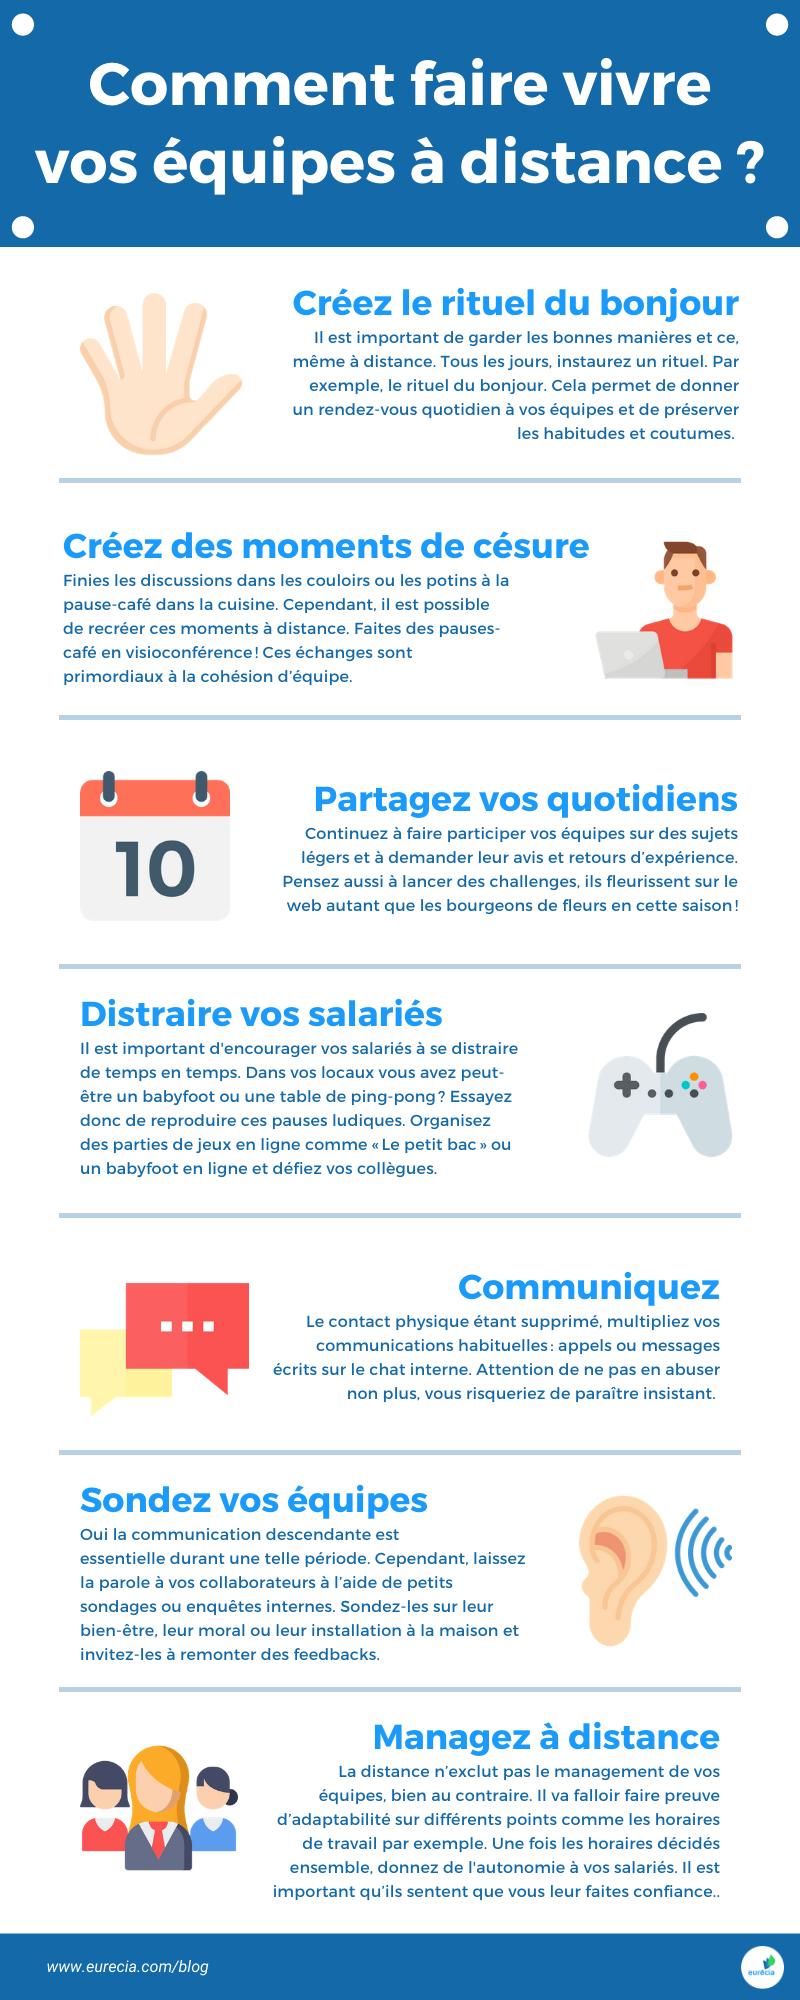 infographie_fairevivreequipedistance_eurecia.png